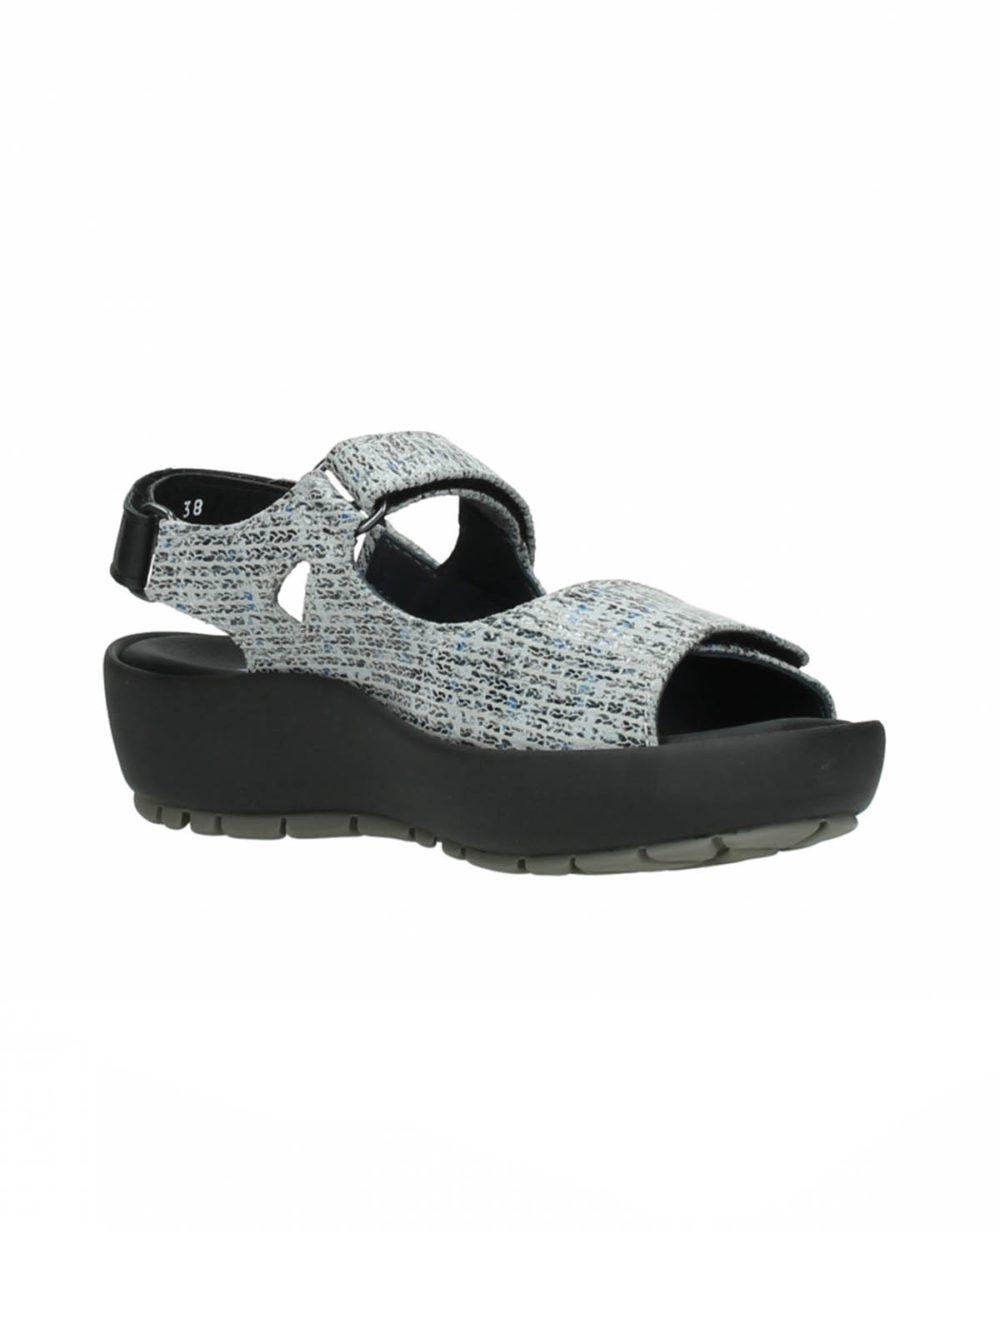 ede26c1755 Jewel Sandal Wolky Shoes Katie Kerr Women s Shoes